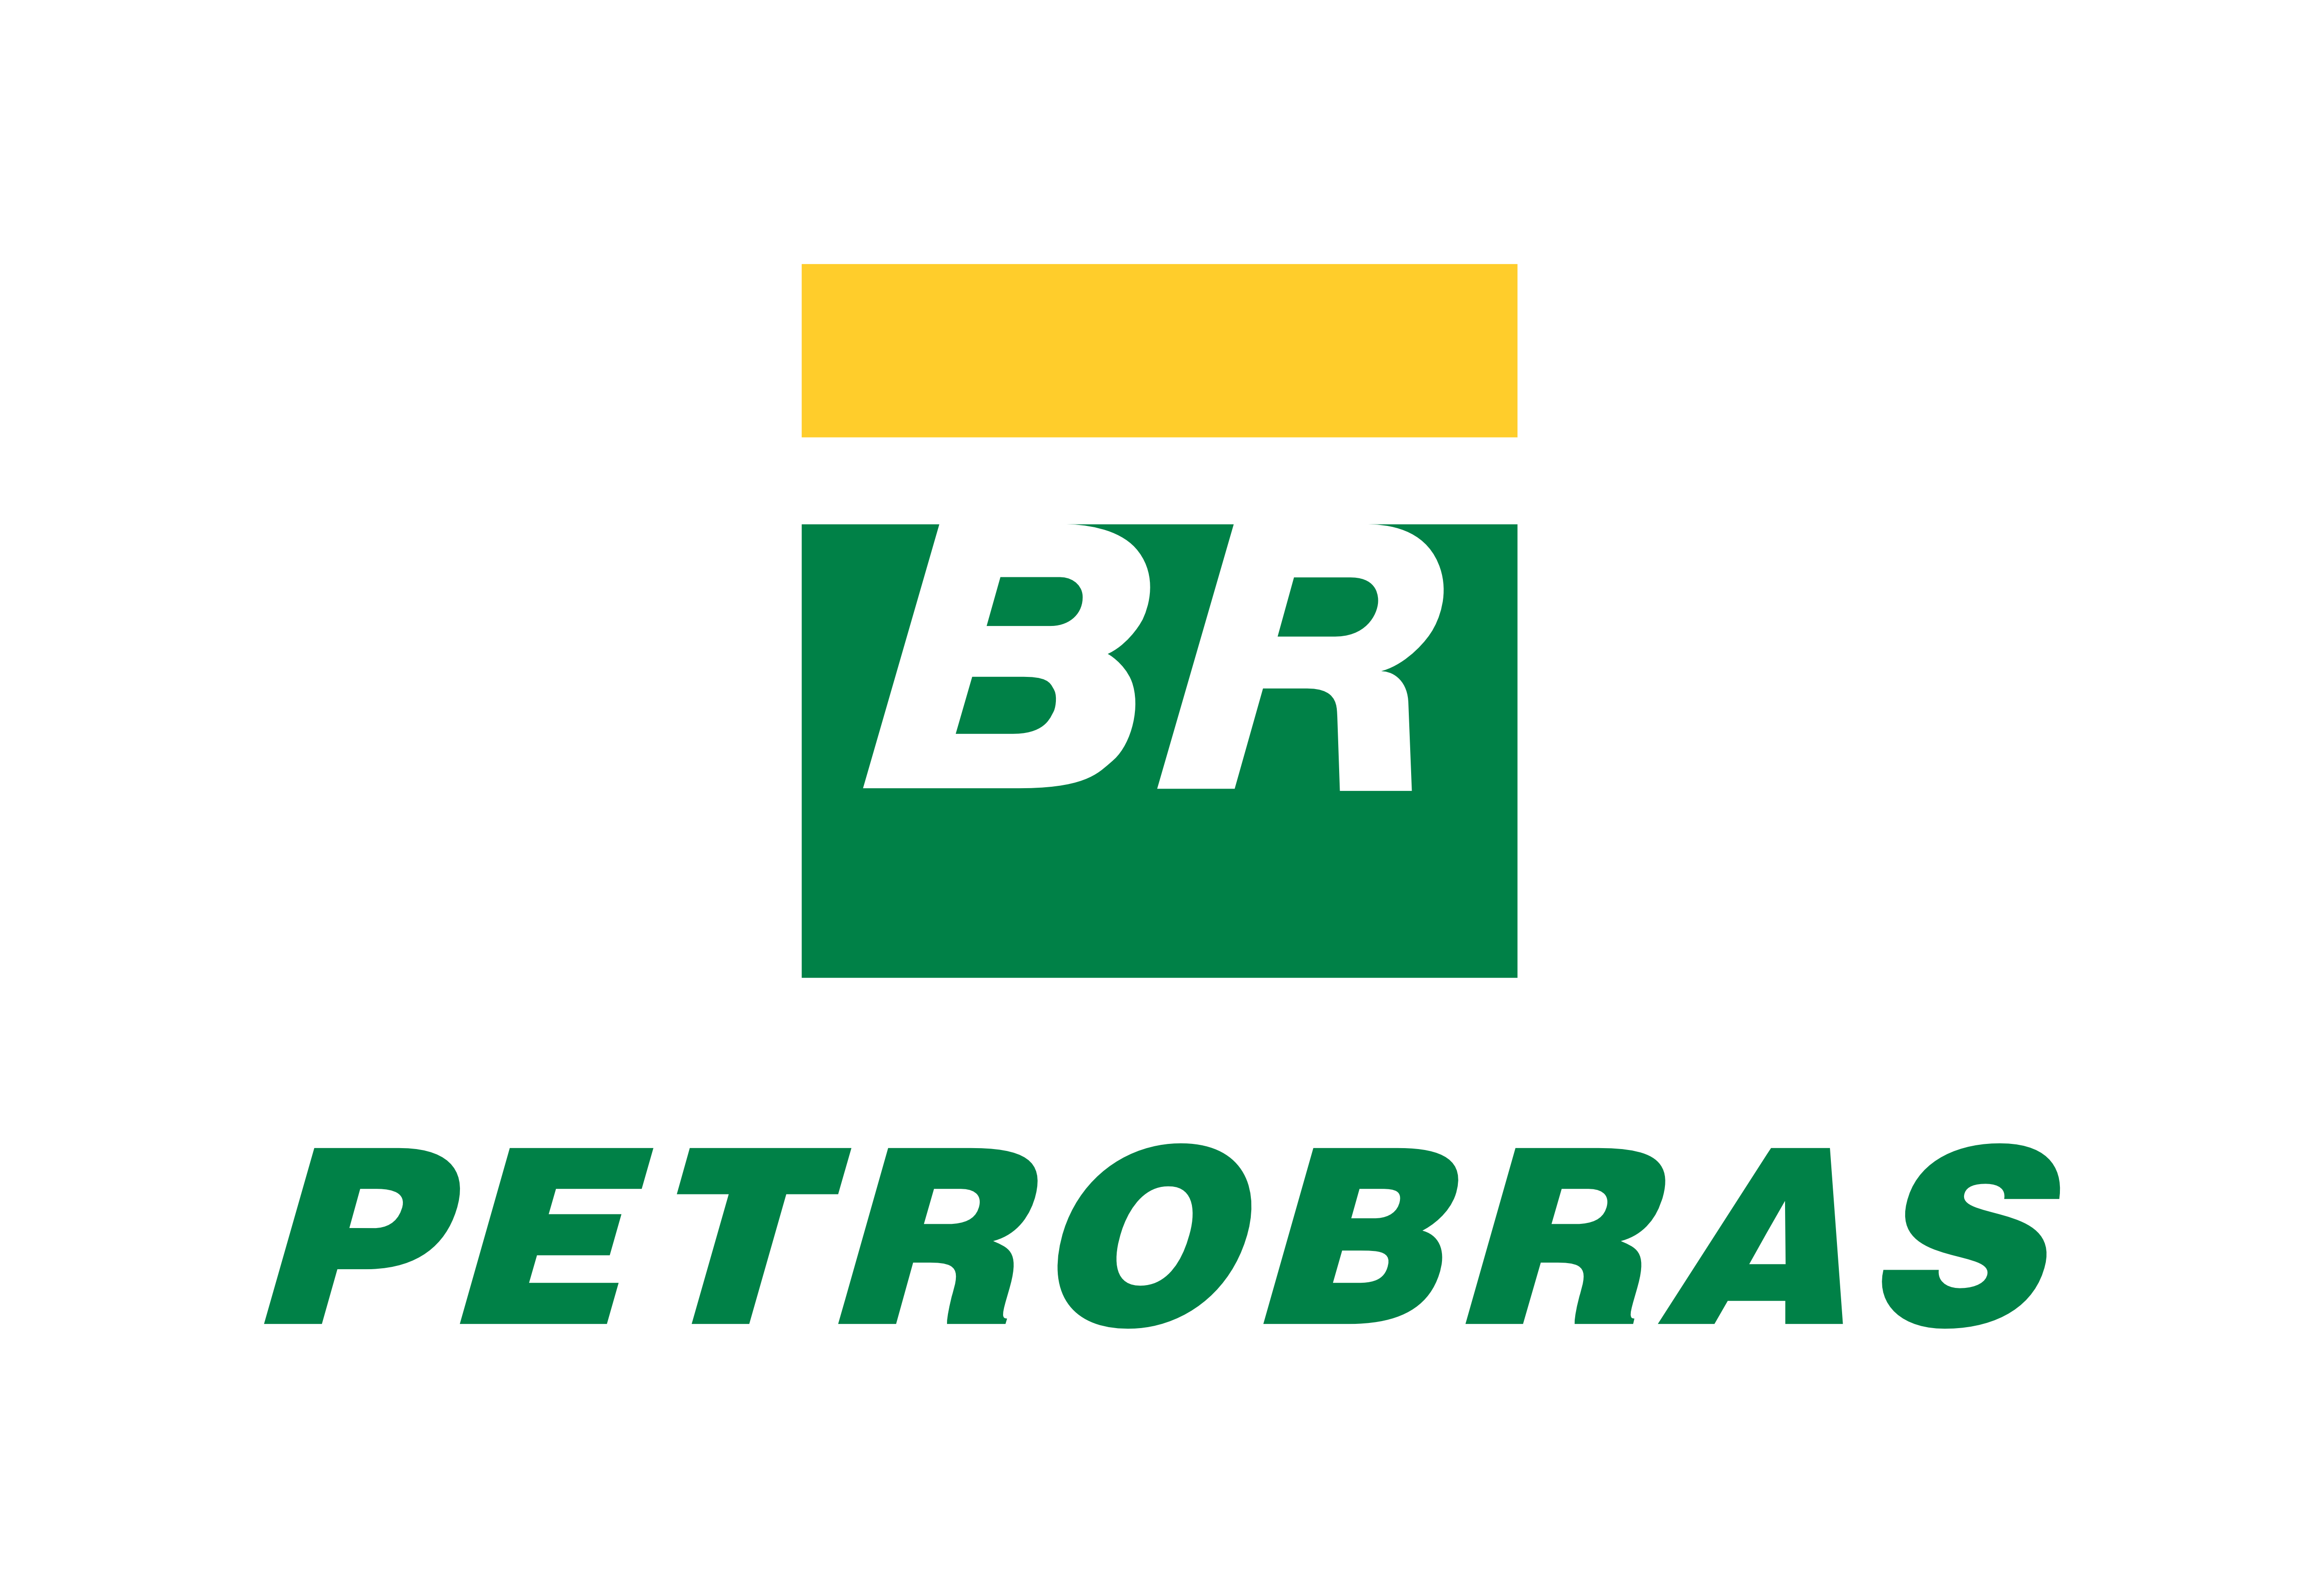 petrobraslogo1png logodownloadorg download de logotipos